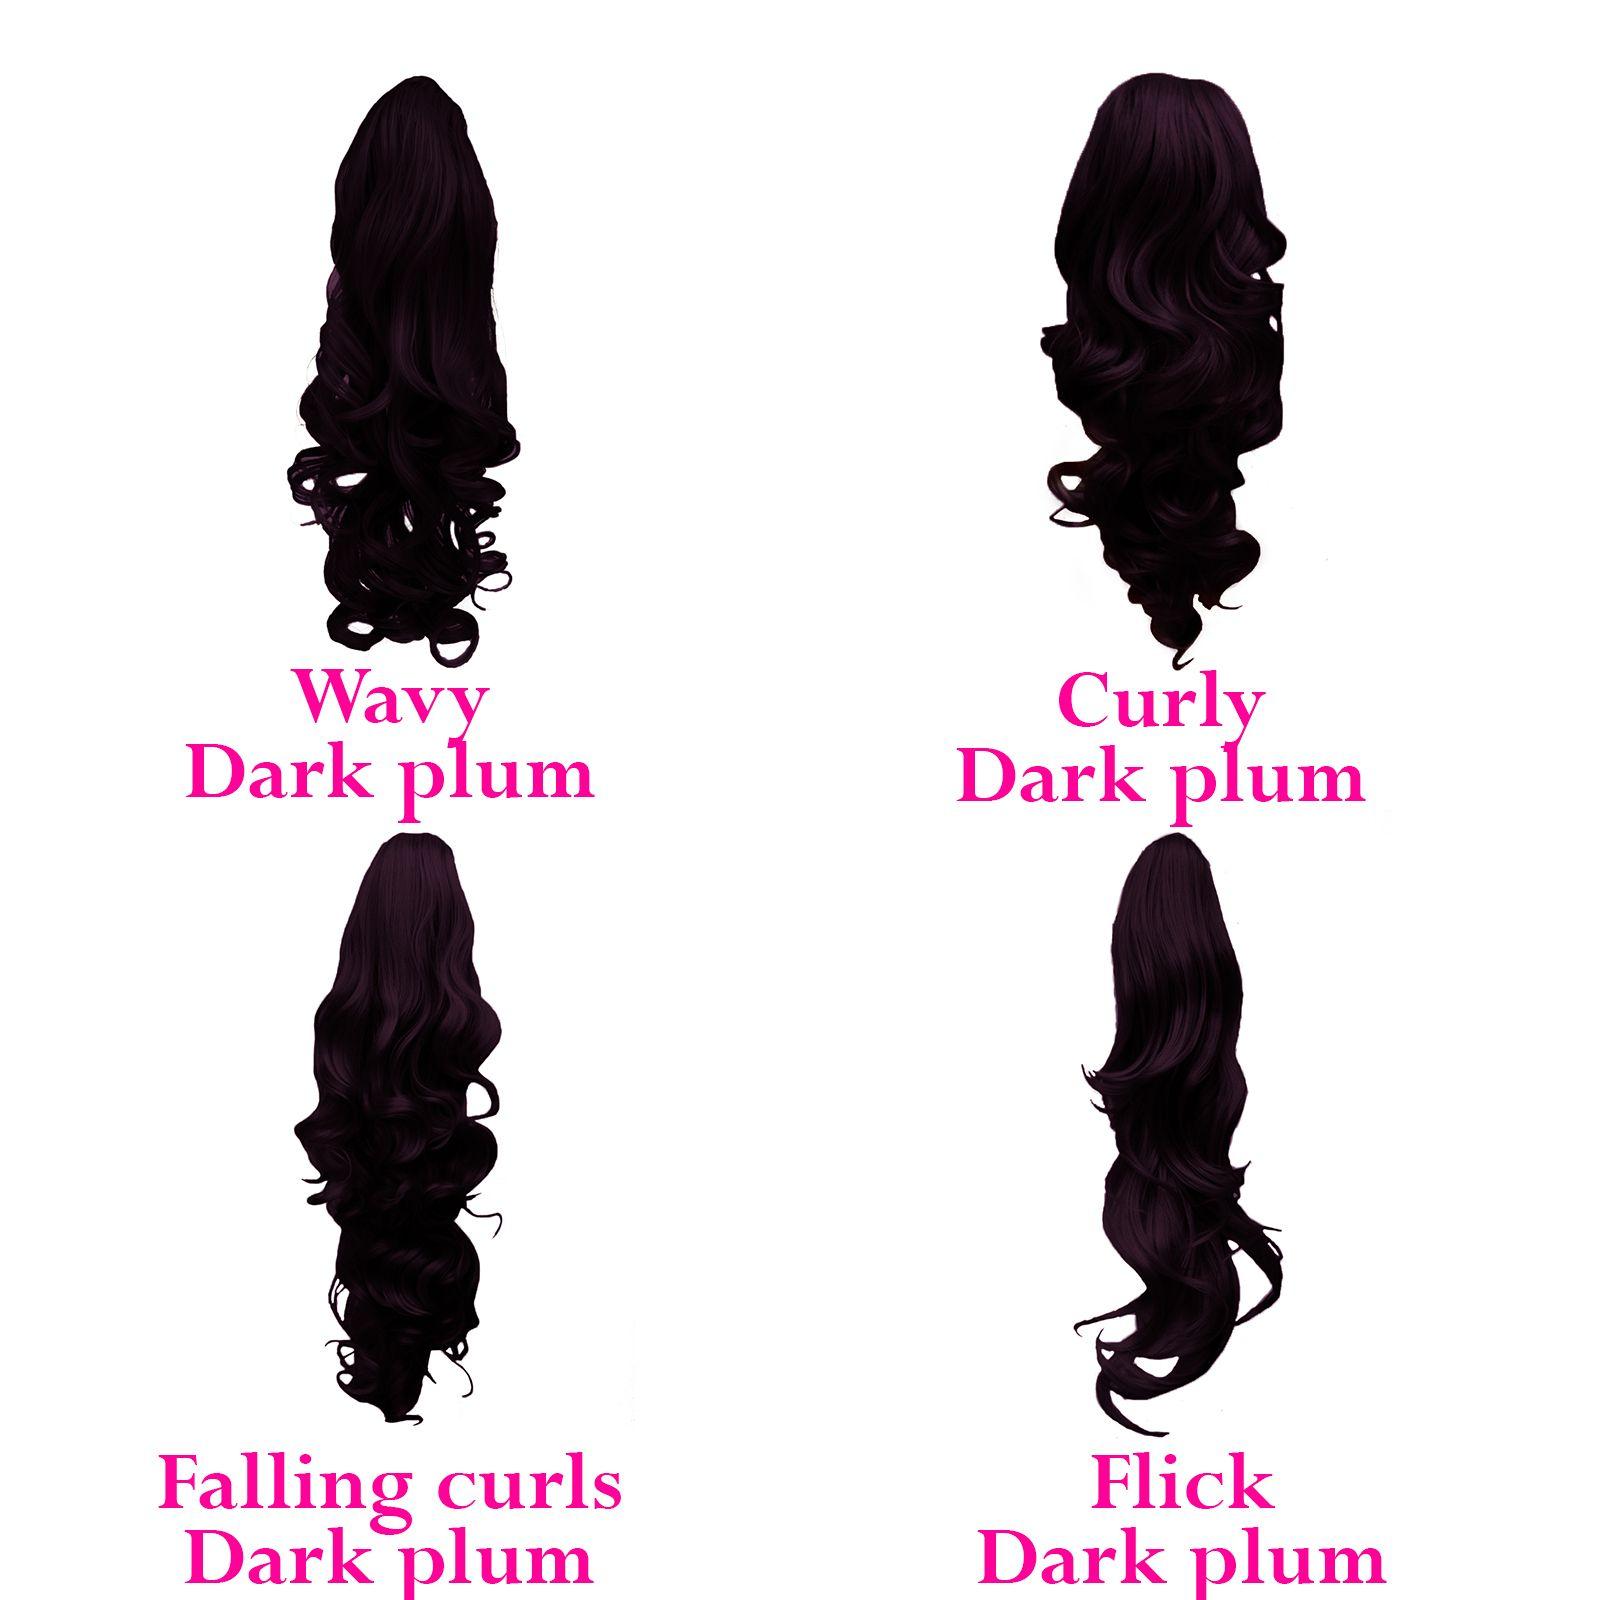 Ponytail Clip In Hair Extensions Dark Plum 99j 1 Hair Extensions Ponytail Pl In 2020 Hair Extensions For Short Hair Clip In Hair Extensions Ponytail Extension